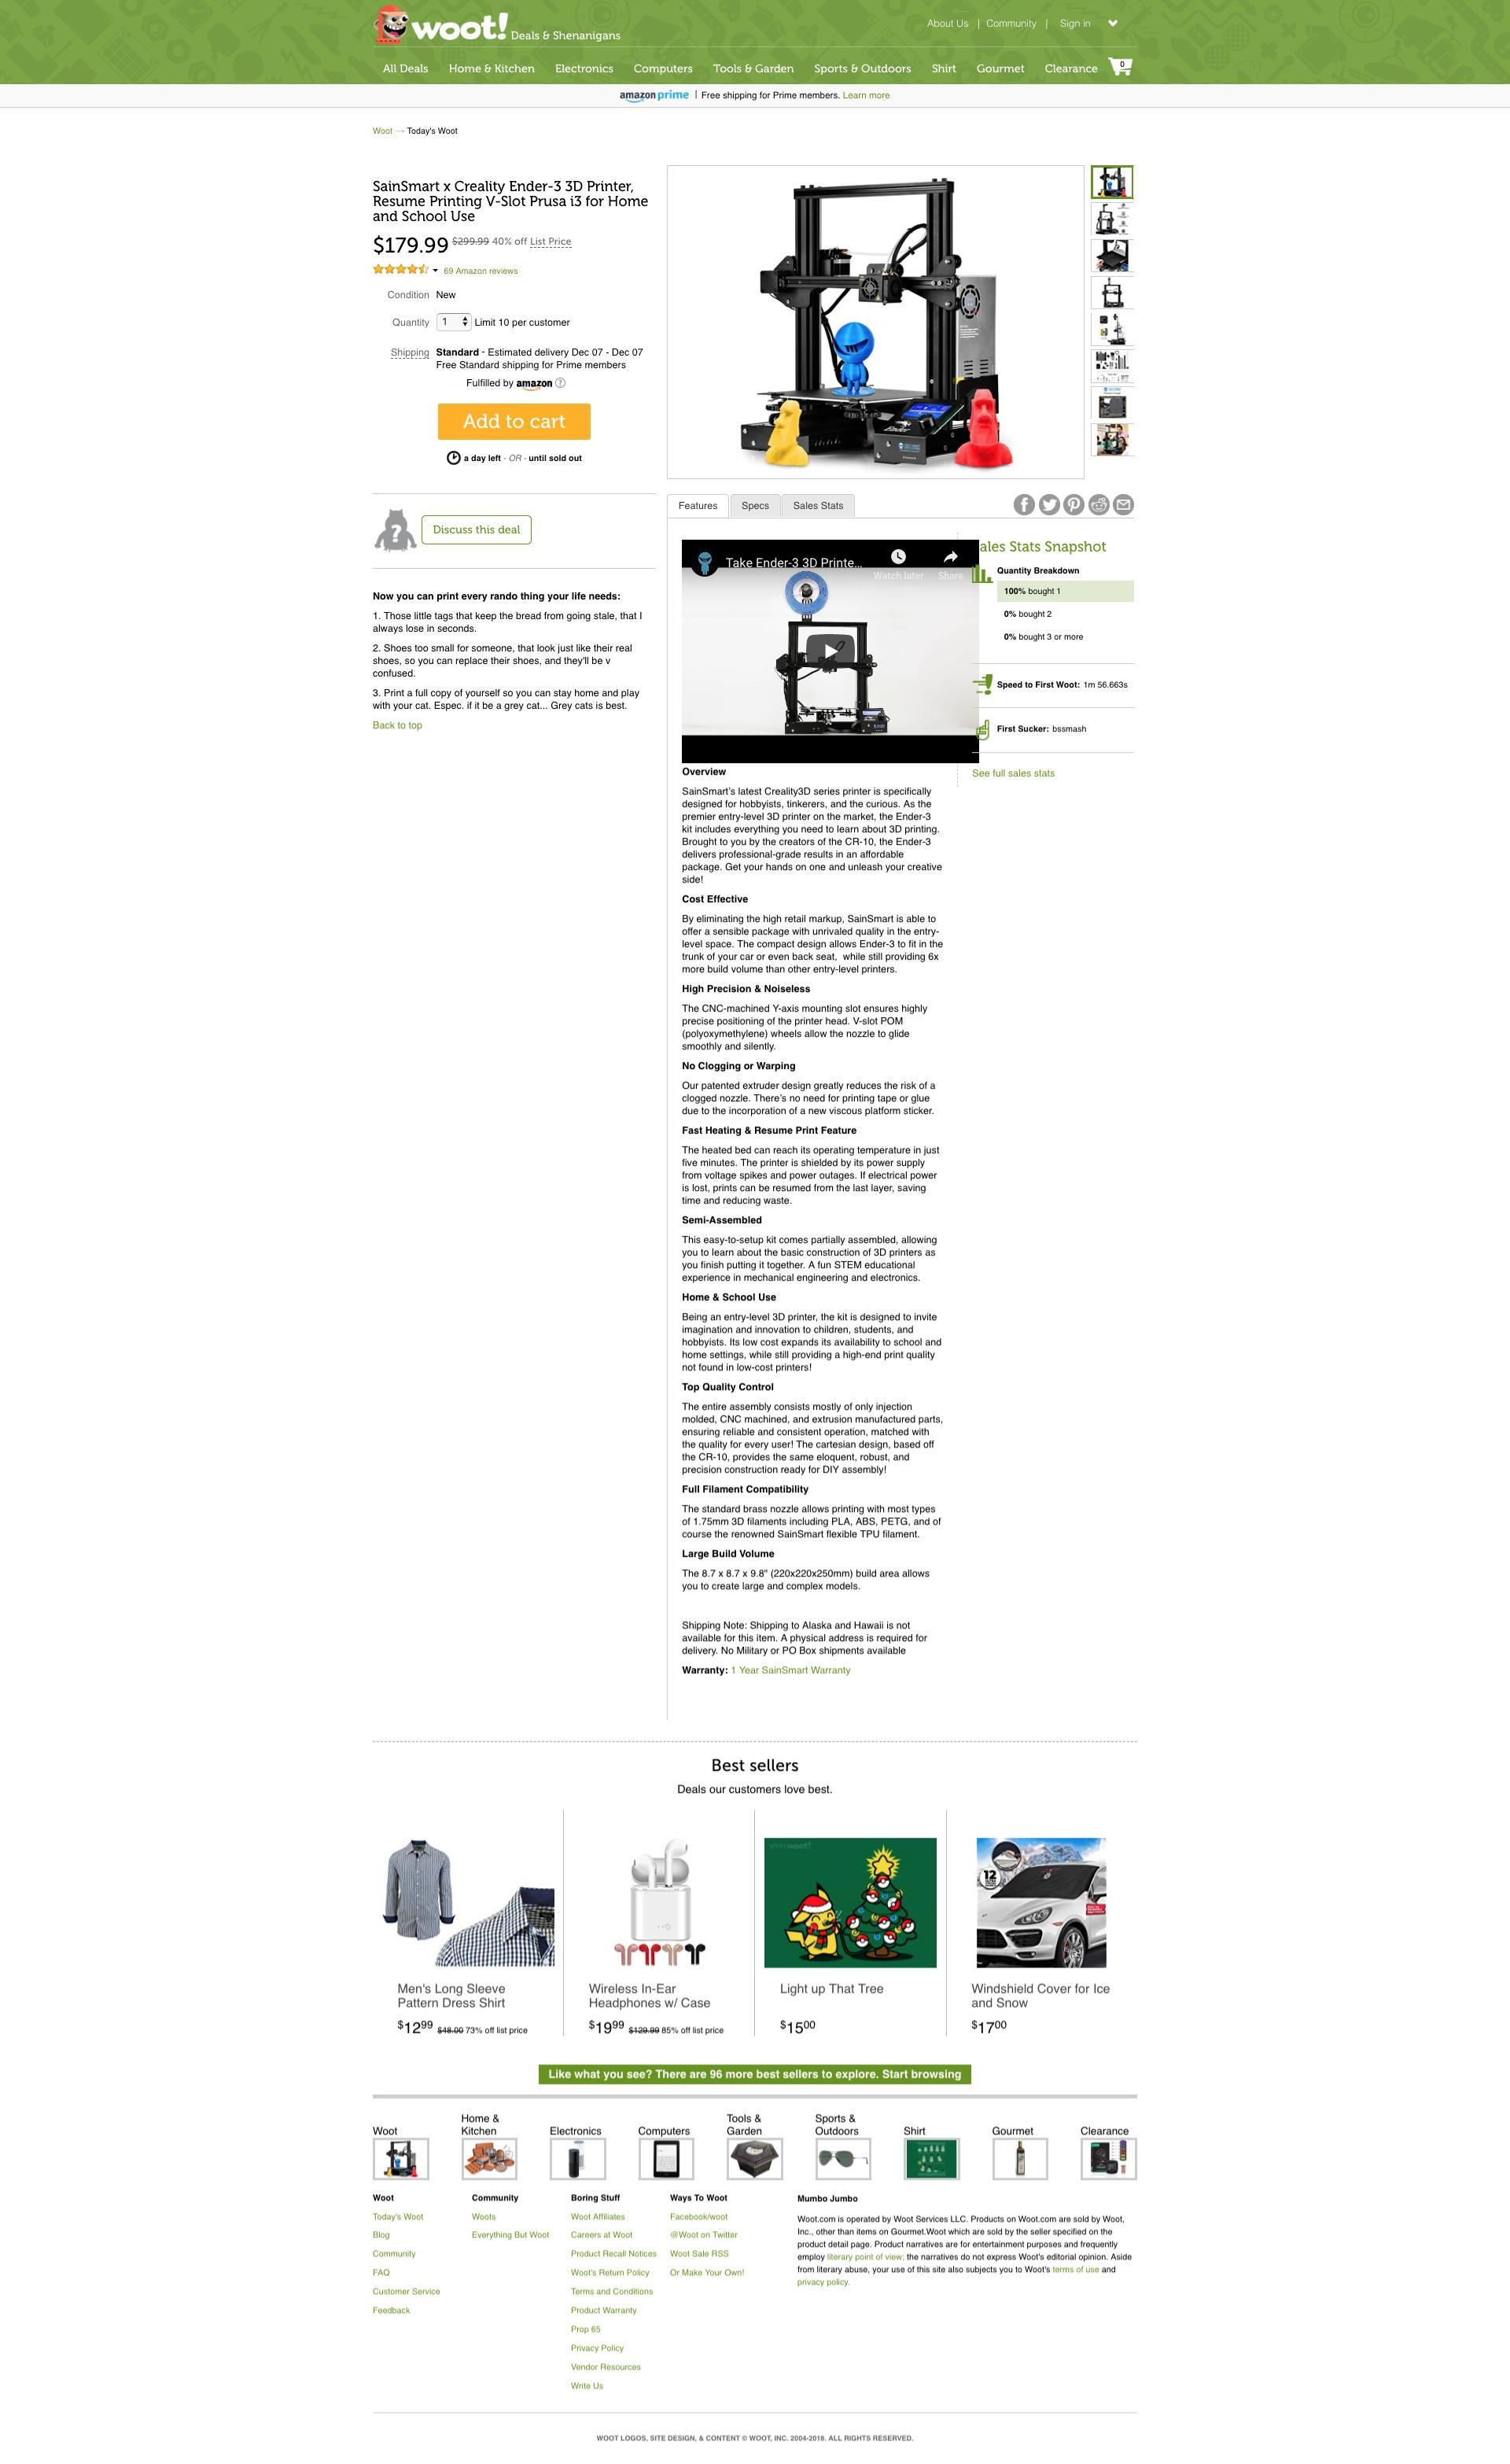 screencapture-woot-offers-sainsmart-x-creality-ender-3-3d-printer-2018-11-30-03_05_08